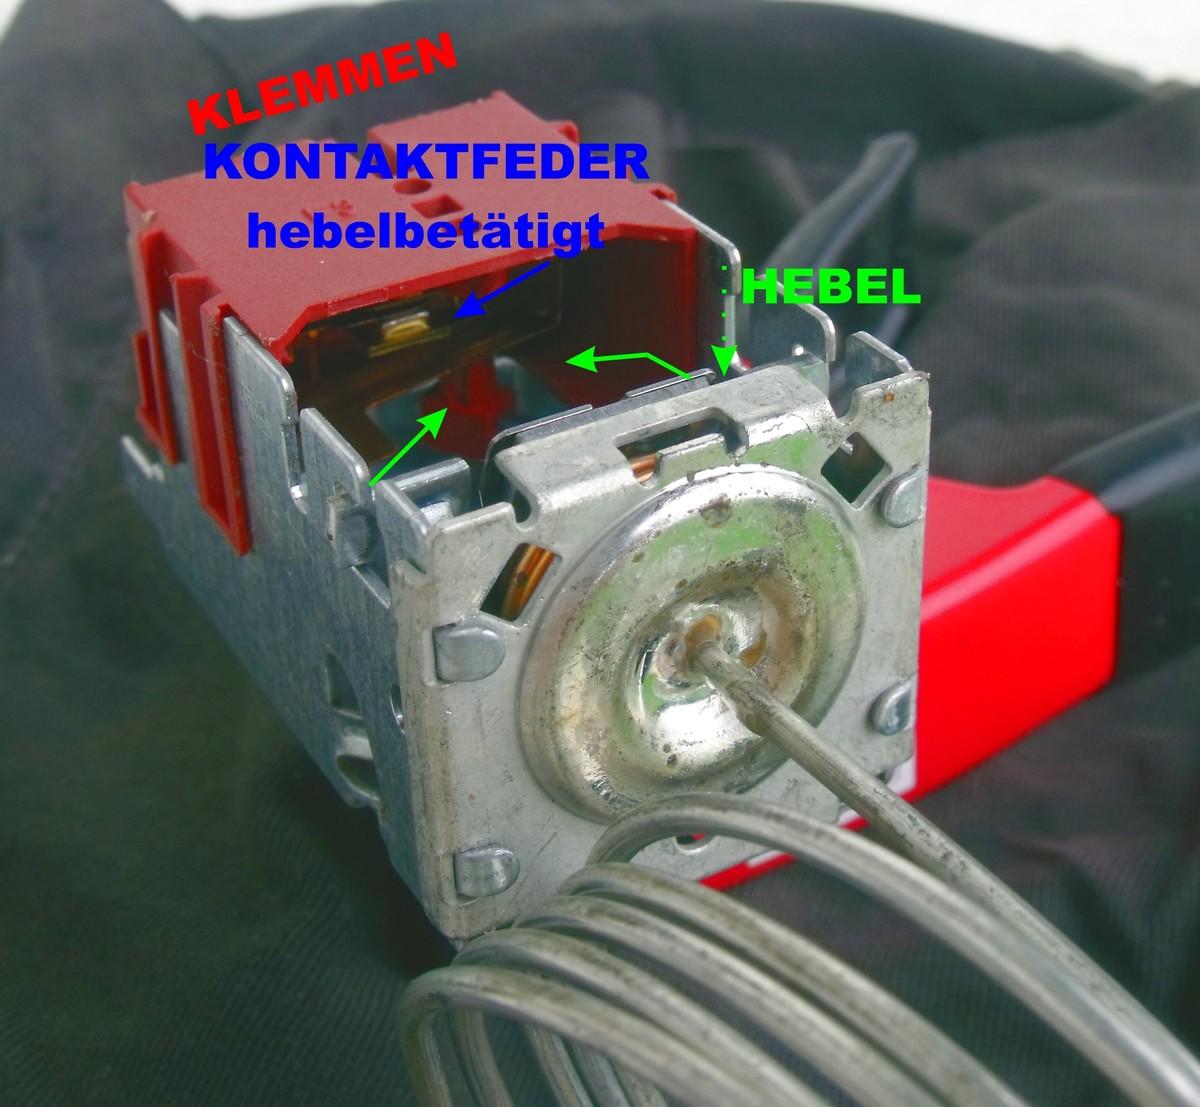 Gut bekannt Kühlschrankthermostat defekt? - Mikrocontroller.net GS96